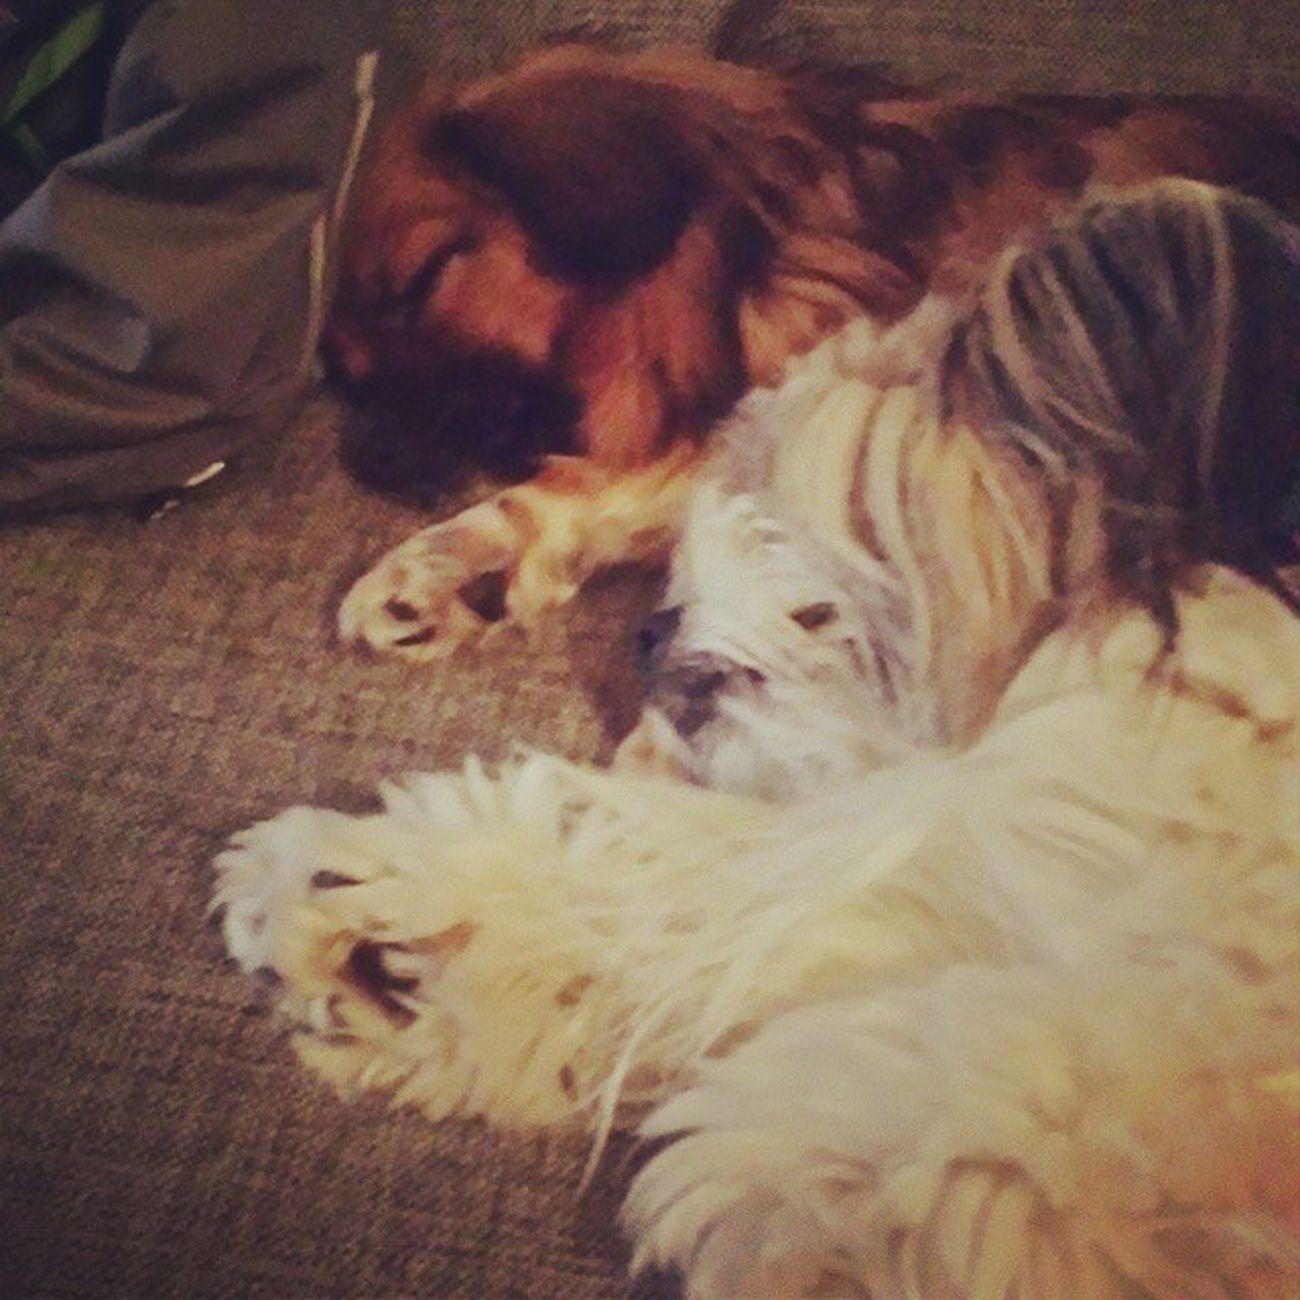 Cute Sleepy Dogs Playing Instadogs DoggyLove Kosegutt Kosejente